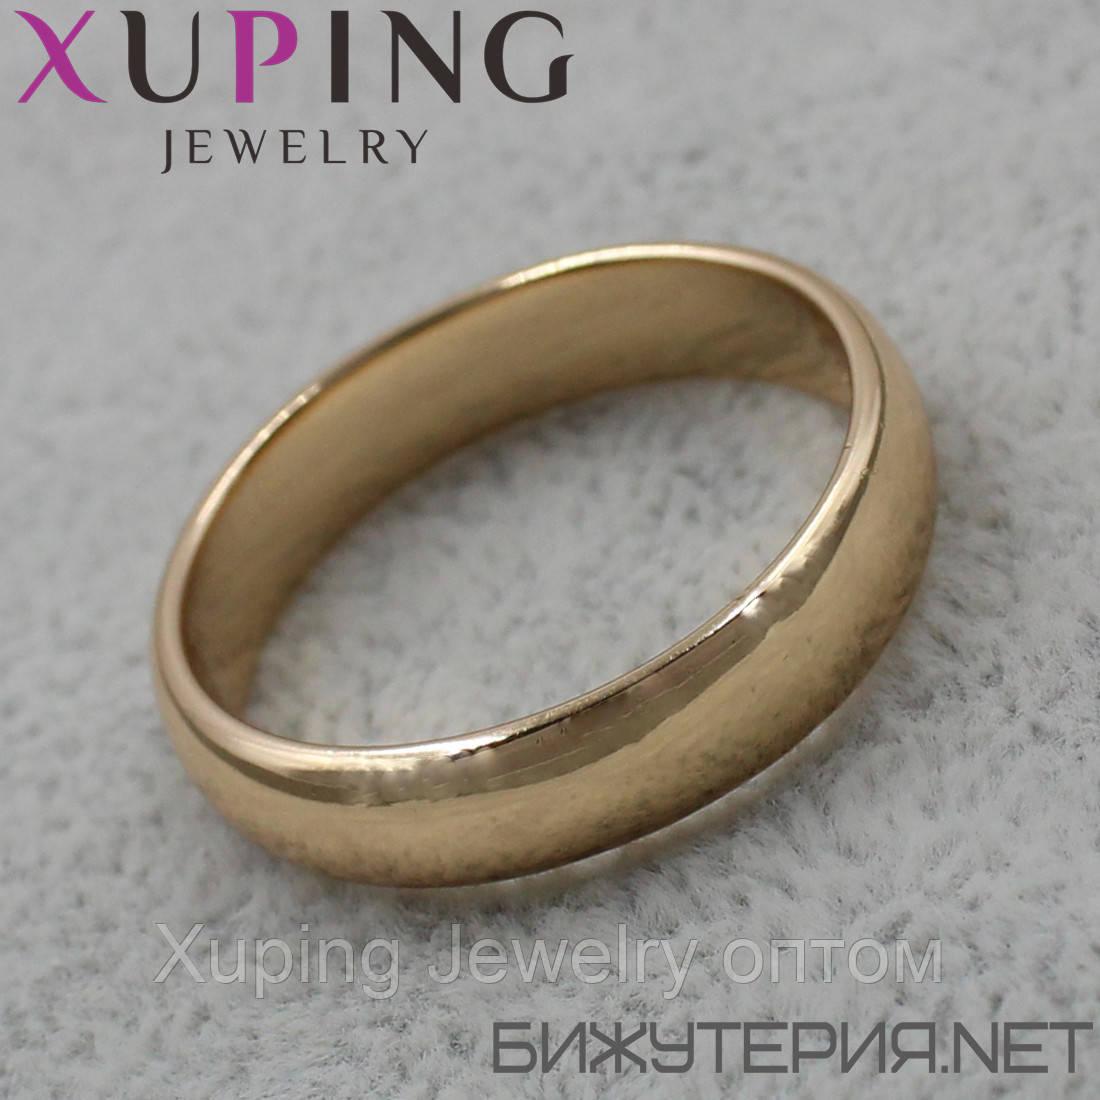 Кольцо Xuping медицинское золото 18K Gold - 1027225918